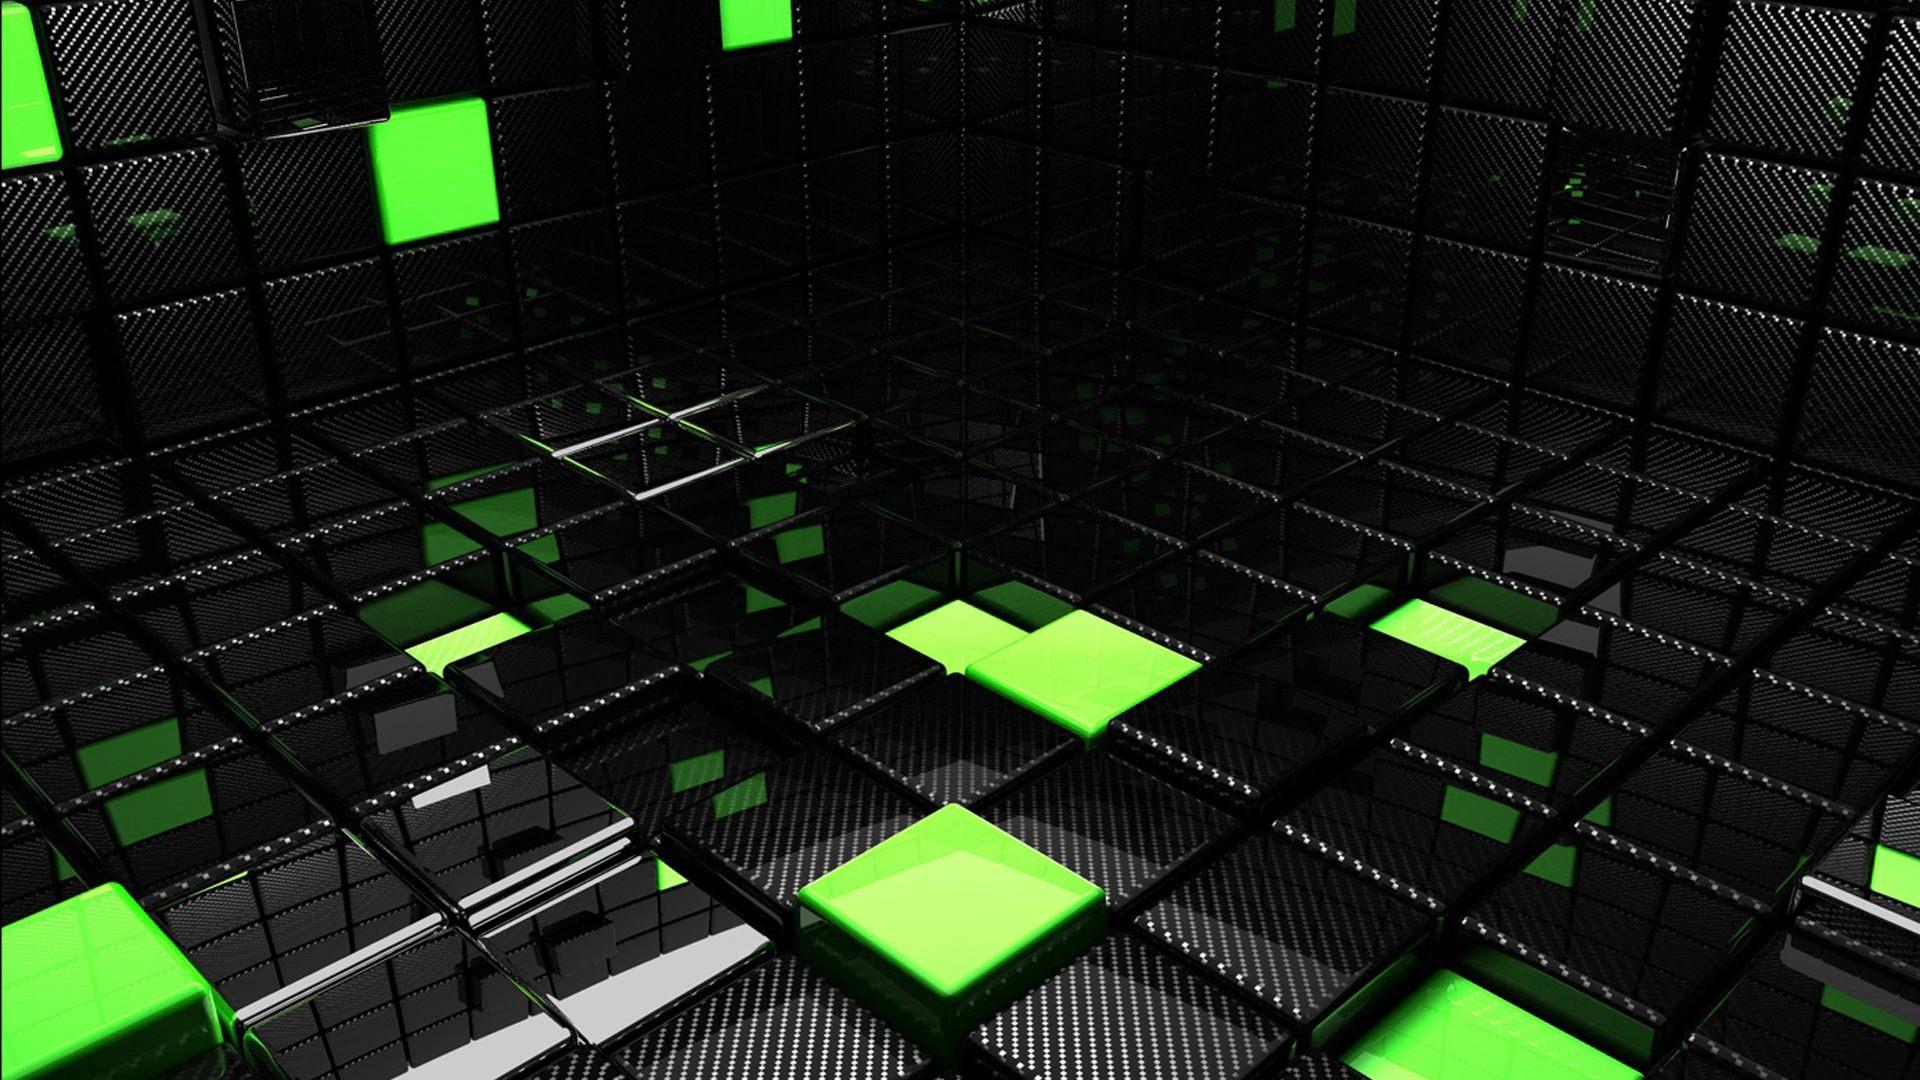 Black & Green Cubes Wallpaper